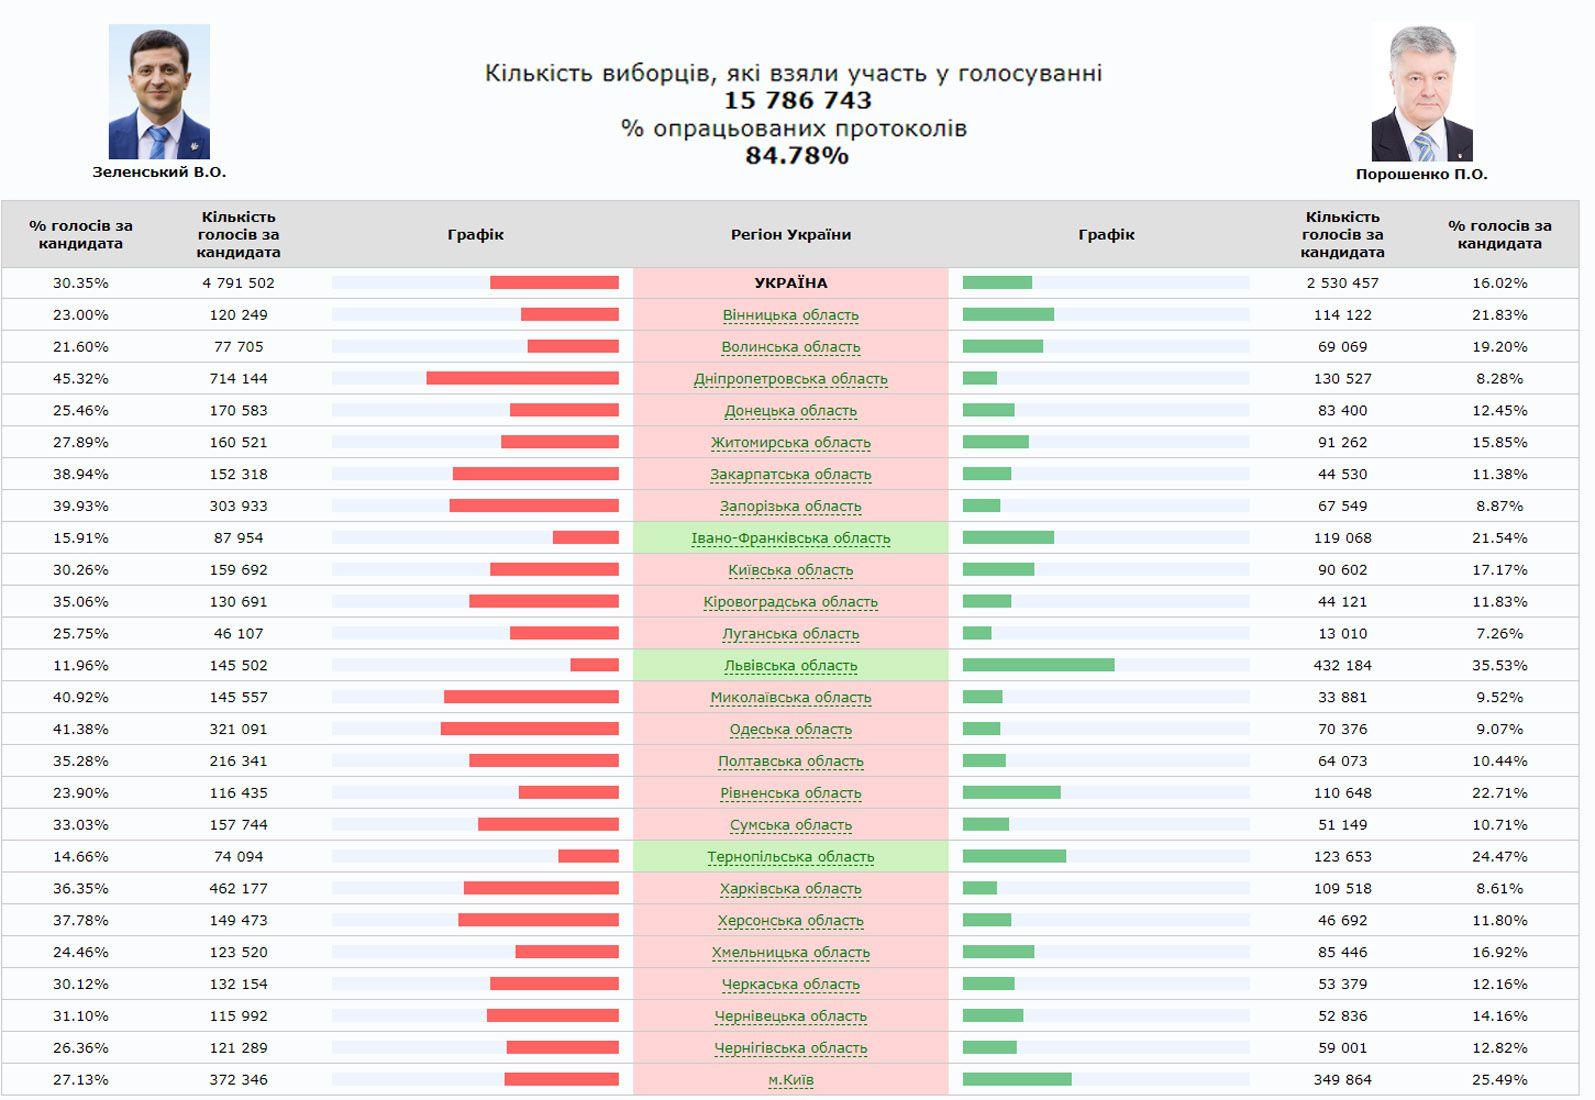 Ucrania por la séptima vez elige al Jefe de Estado